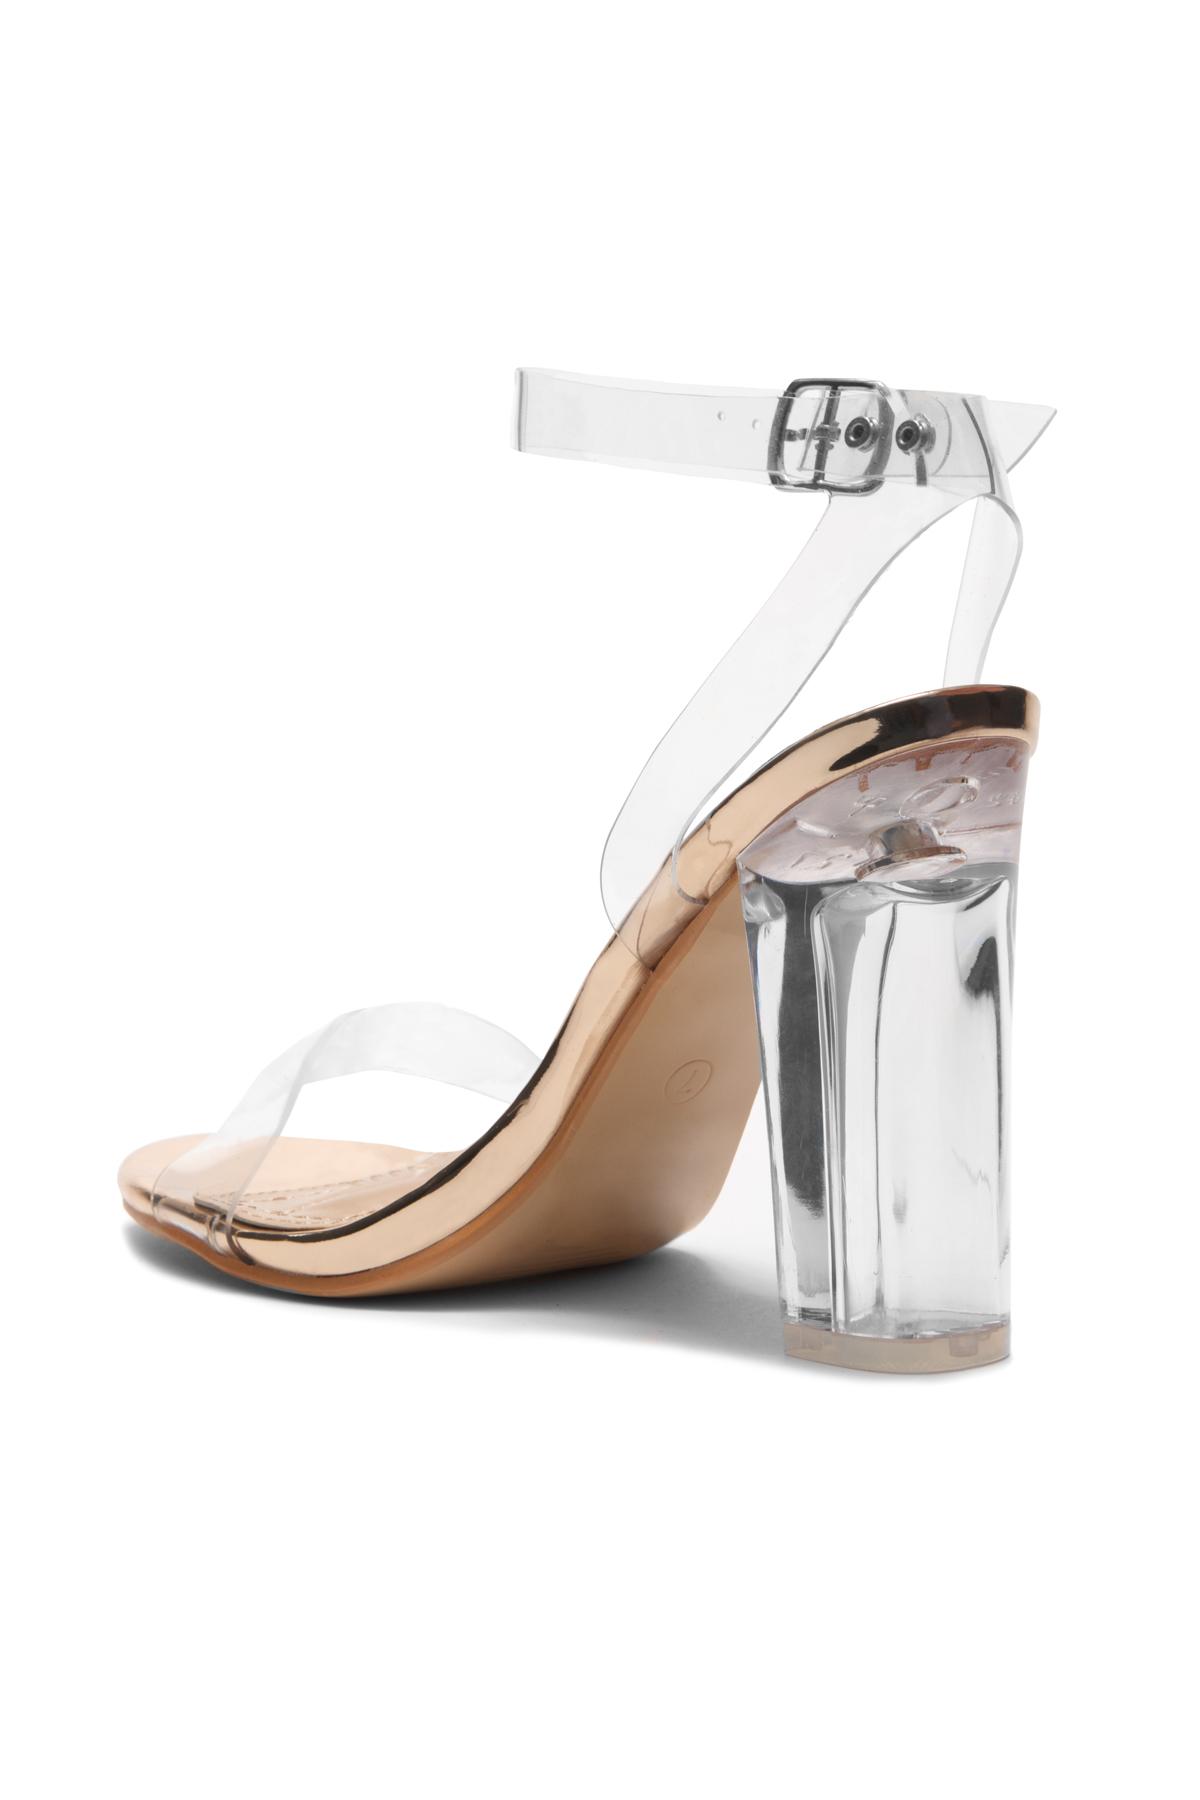 f230e7ceb67 ... HerStyle Women s Manmade Allissa Perspex heel